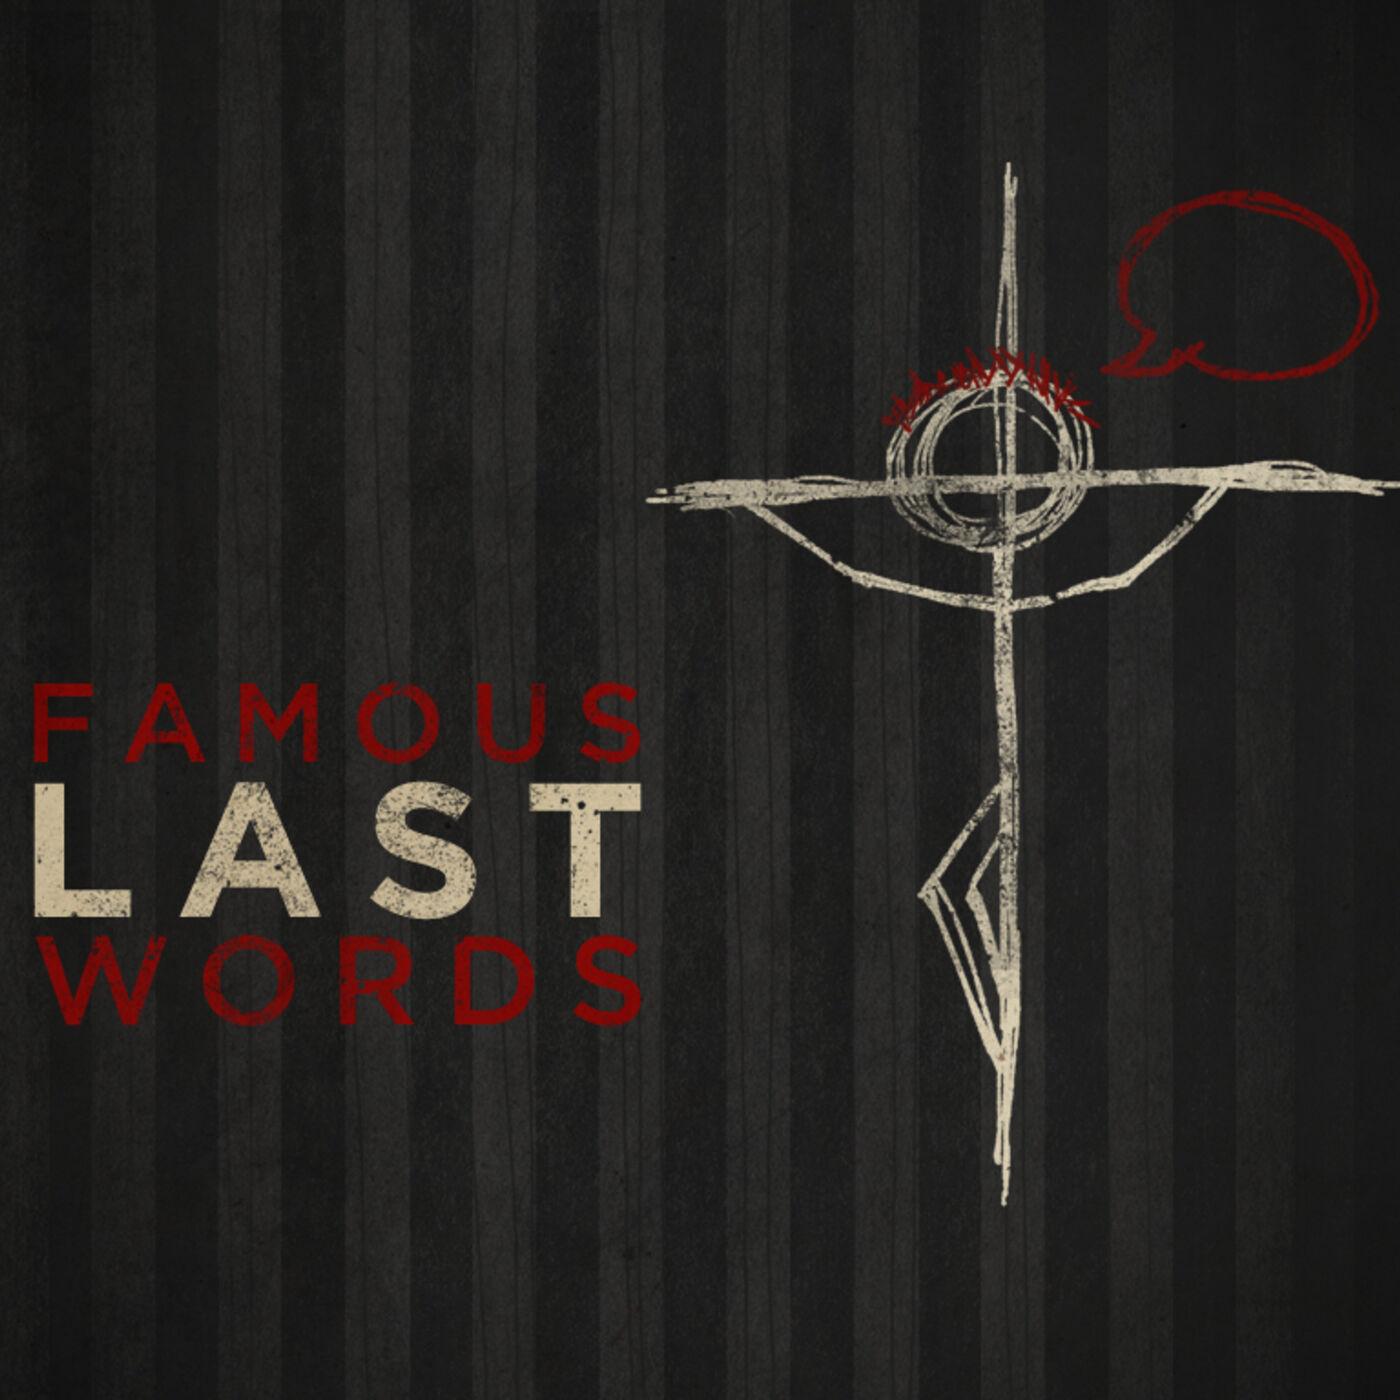 Famous Last Words - Week 5